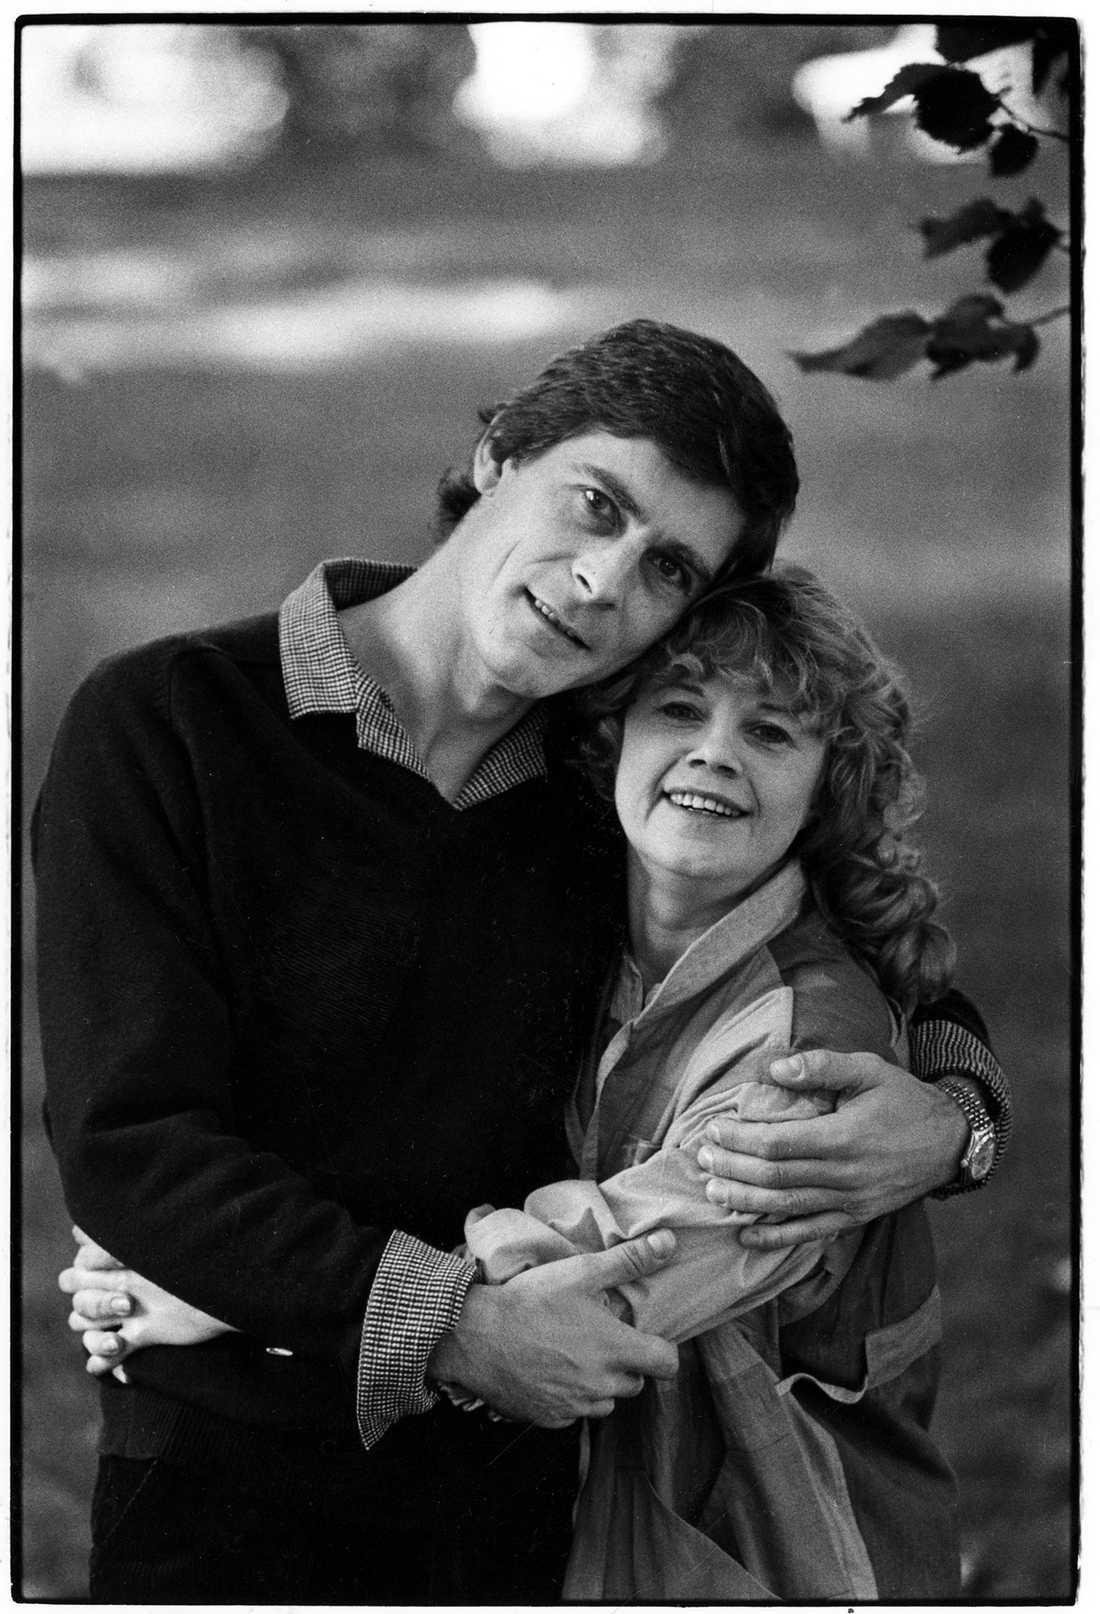 Pontén och Lena Nyman 1982.